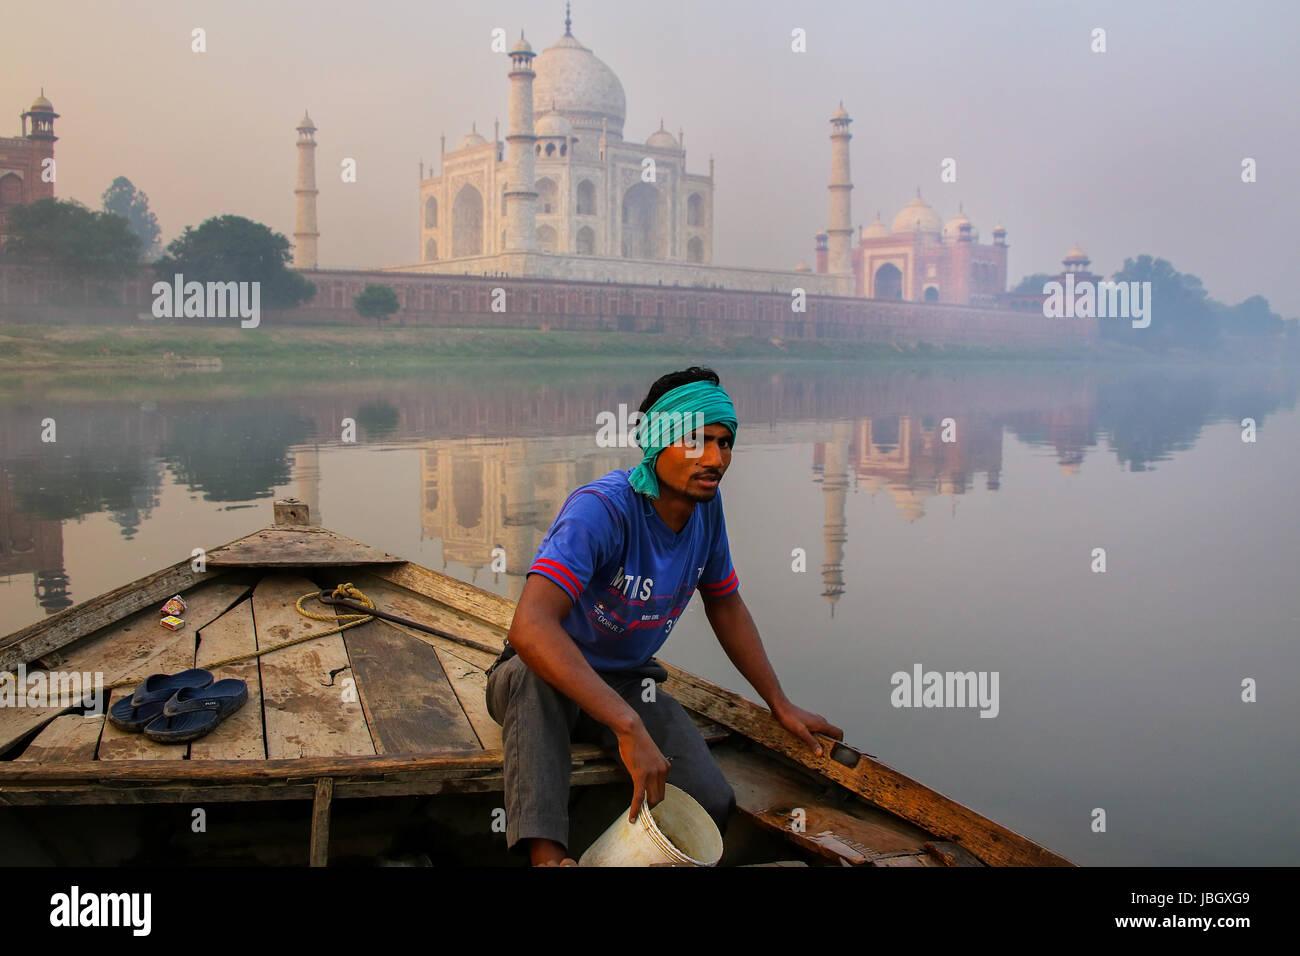 Lokaler Mann Rettung Wasser aus dem Boot am Yamuna Fluss in der Nähe des Taj Mahal, Agra, Uttar Pradesh, Indien. Stockbild